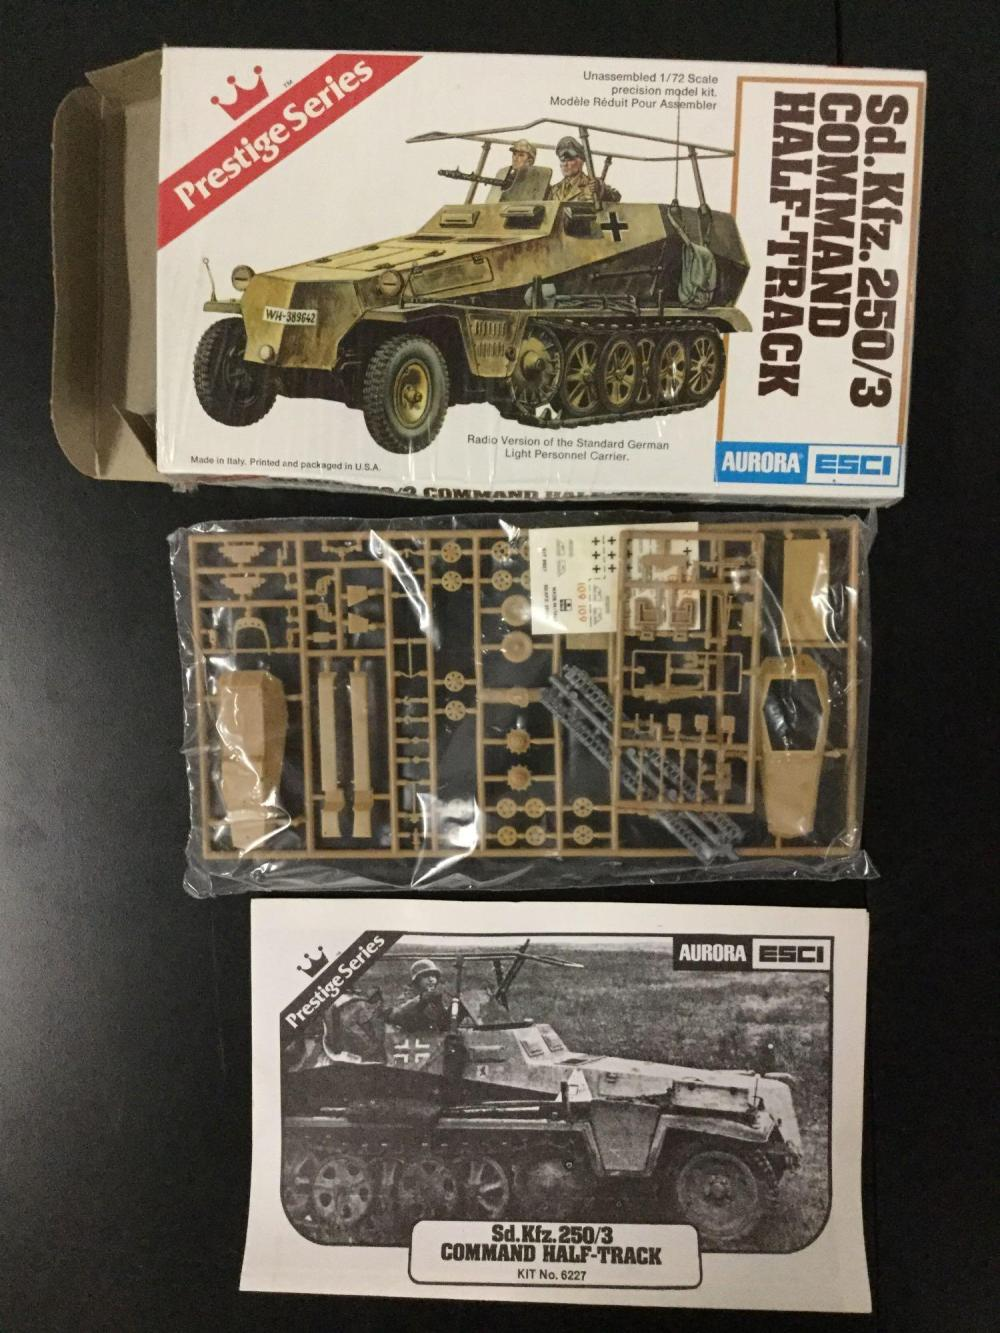 6x Aurora-ESCI military plastic model kits, 1/72 scale